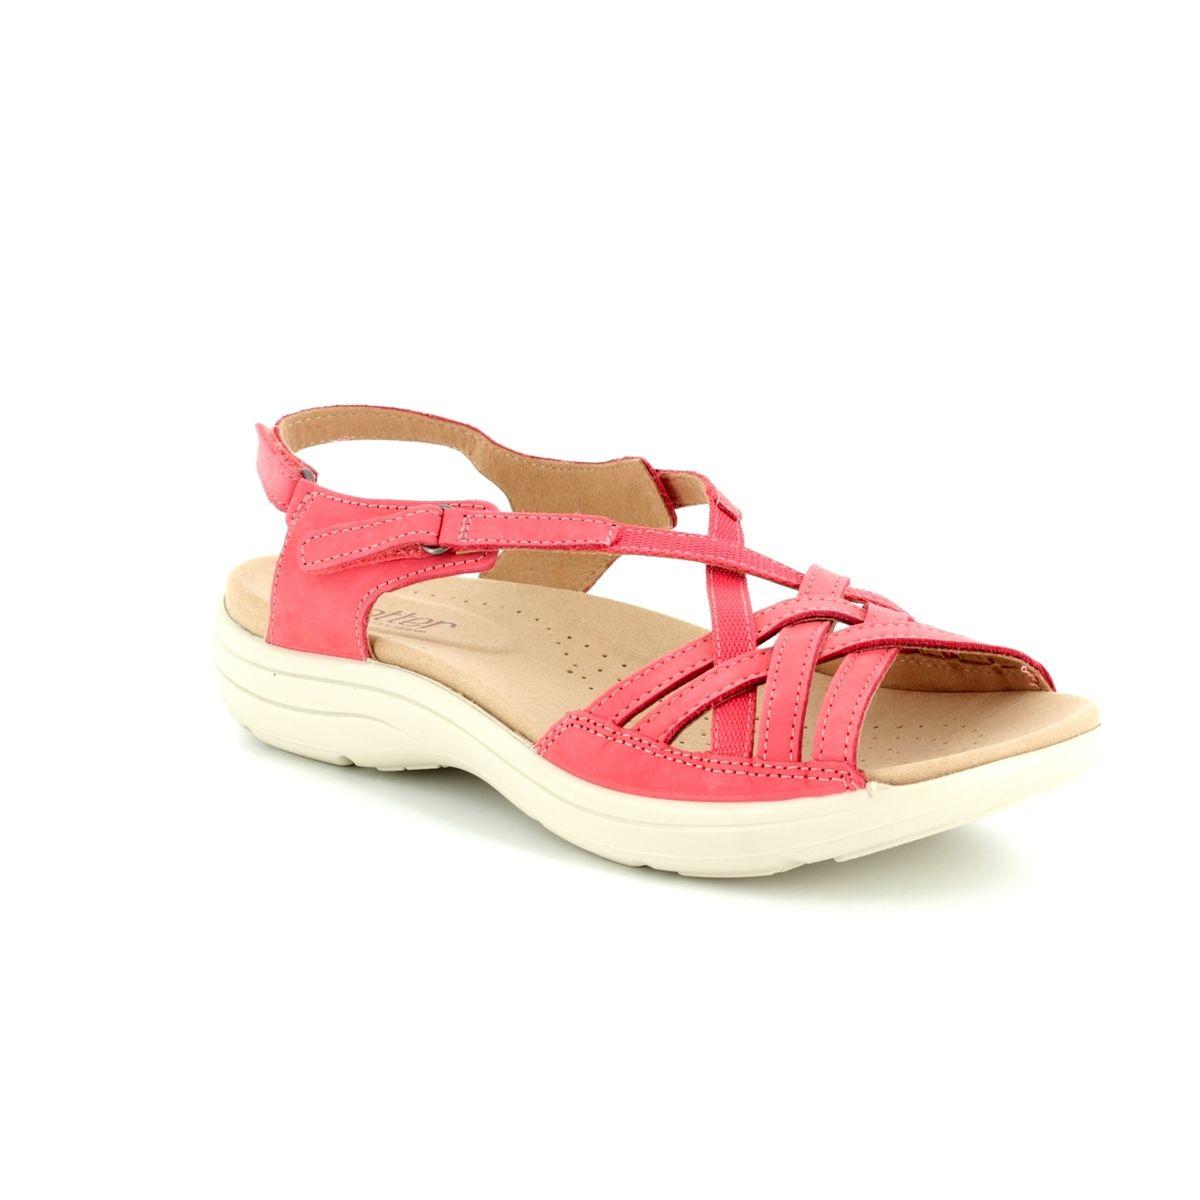 8499380d87c04 Hotter Maisie E Fit 8109-80 Coral pink sandals